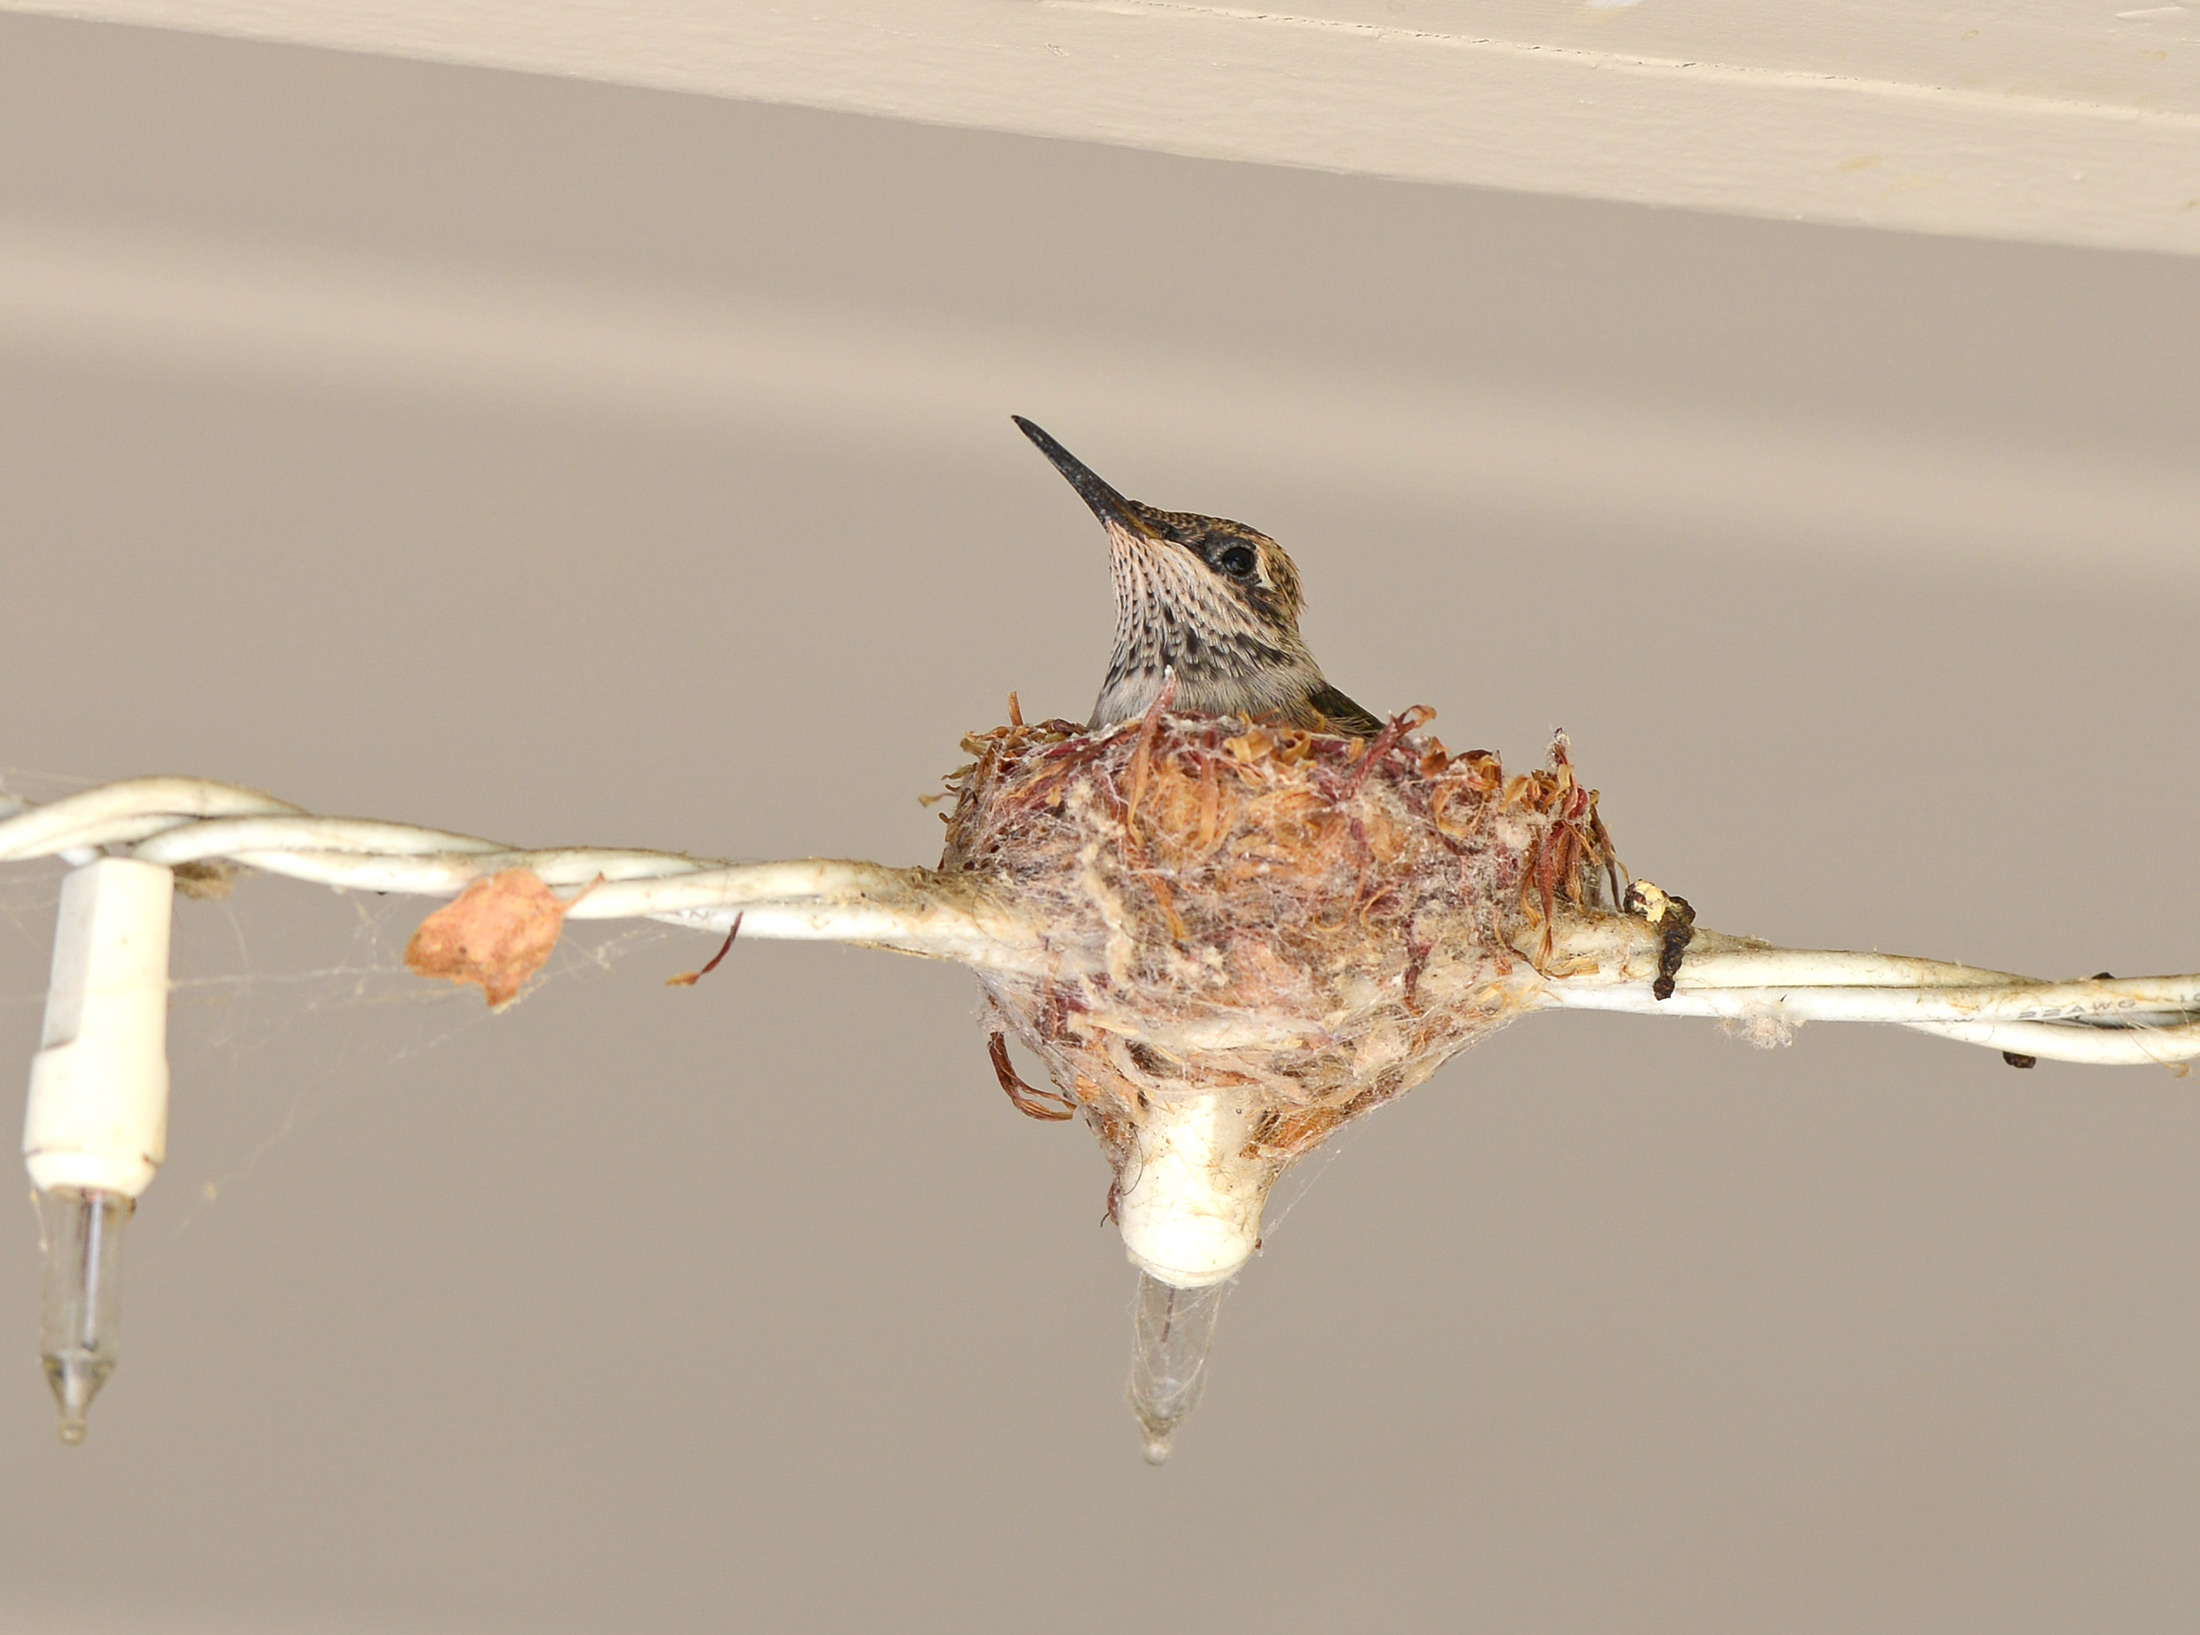 Hummingbird_Day19_Alone_DSC_5410